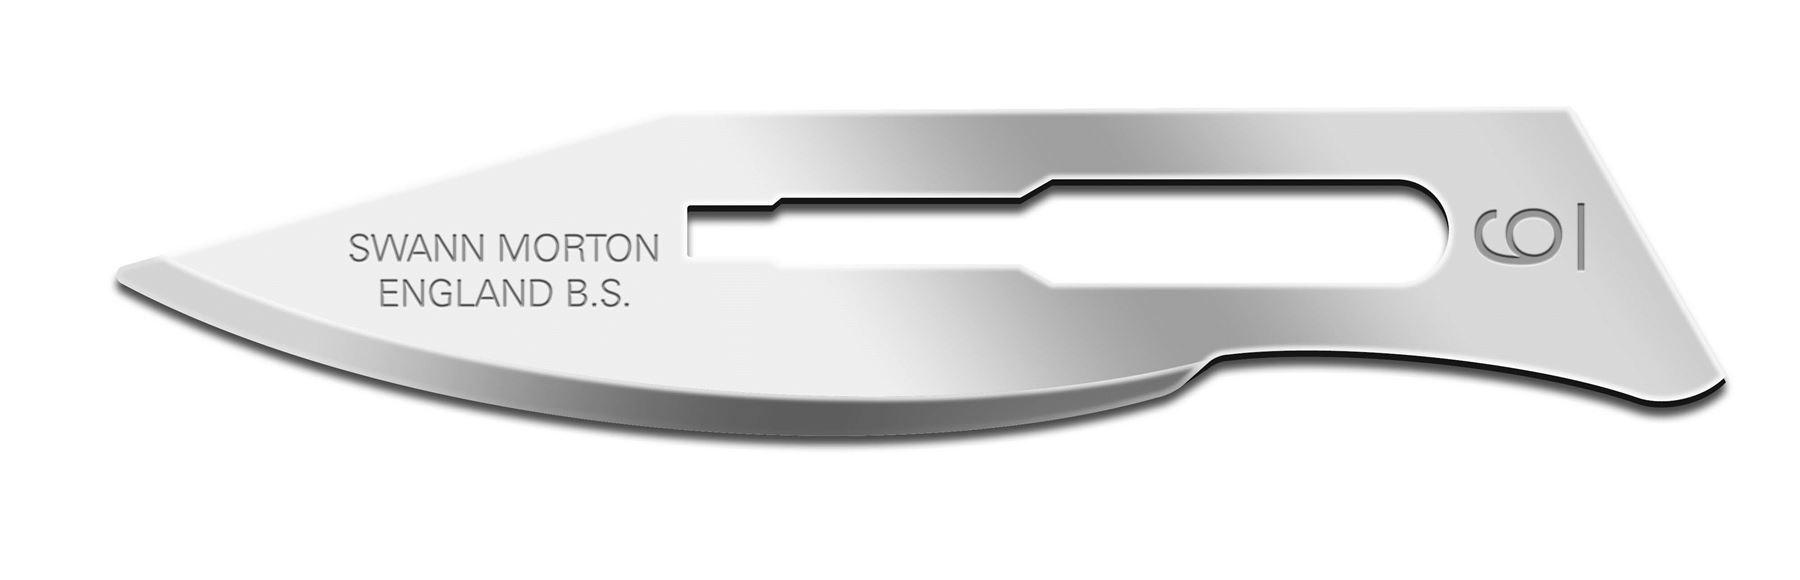 Genuine swann morton sterile red box scalpel blades for Swann morton craft knife